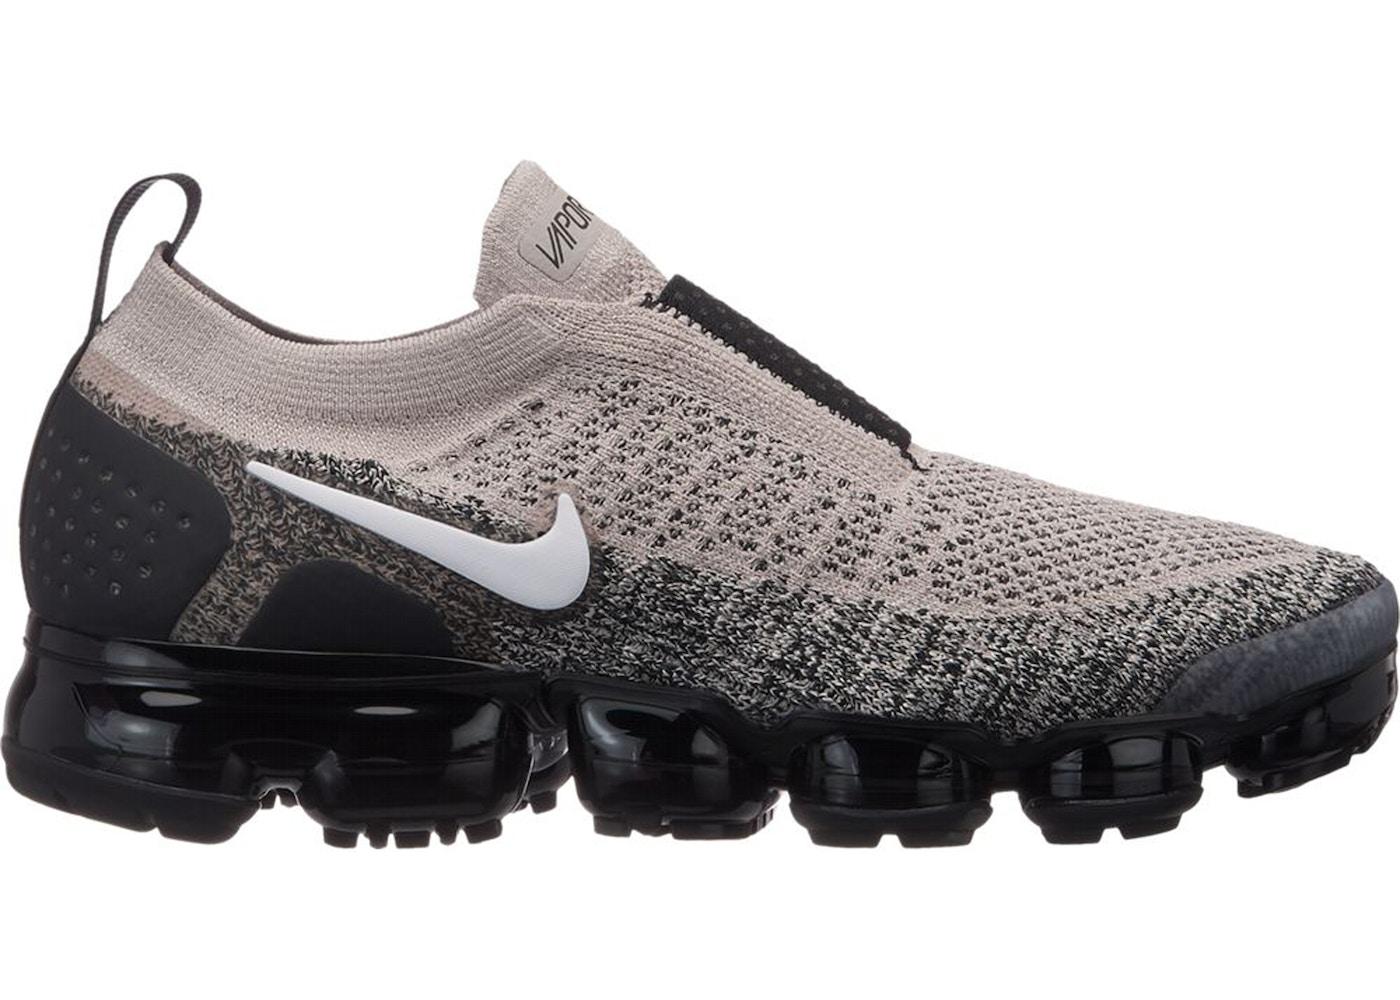 promo code 1e166 7195c Buy Nike Air Max VaporMax Shoes  Deadstock Sneakers